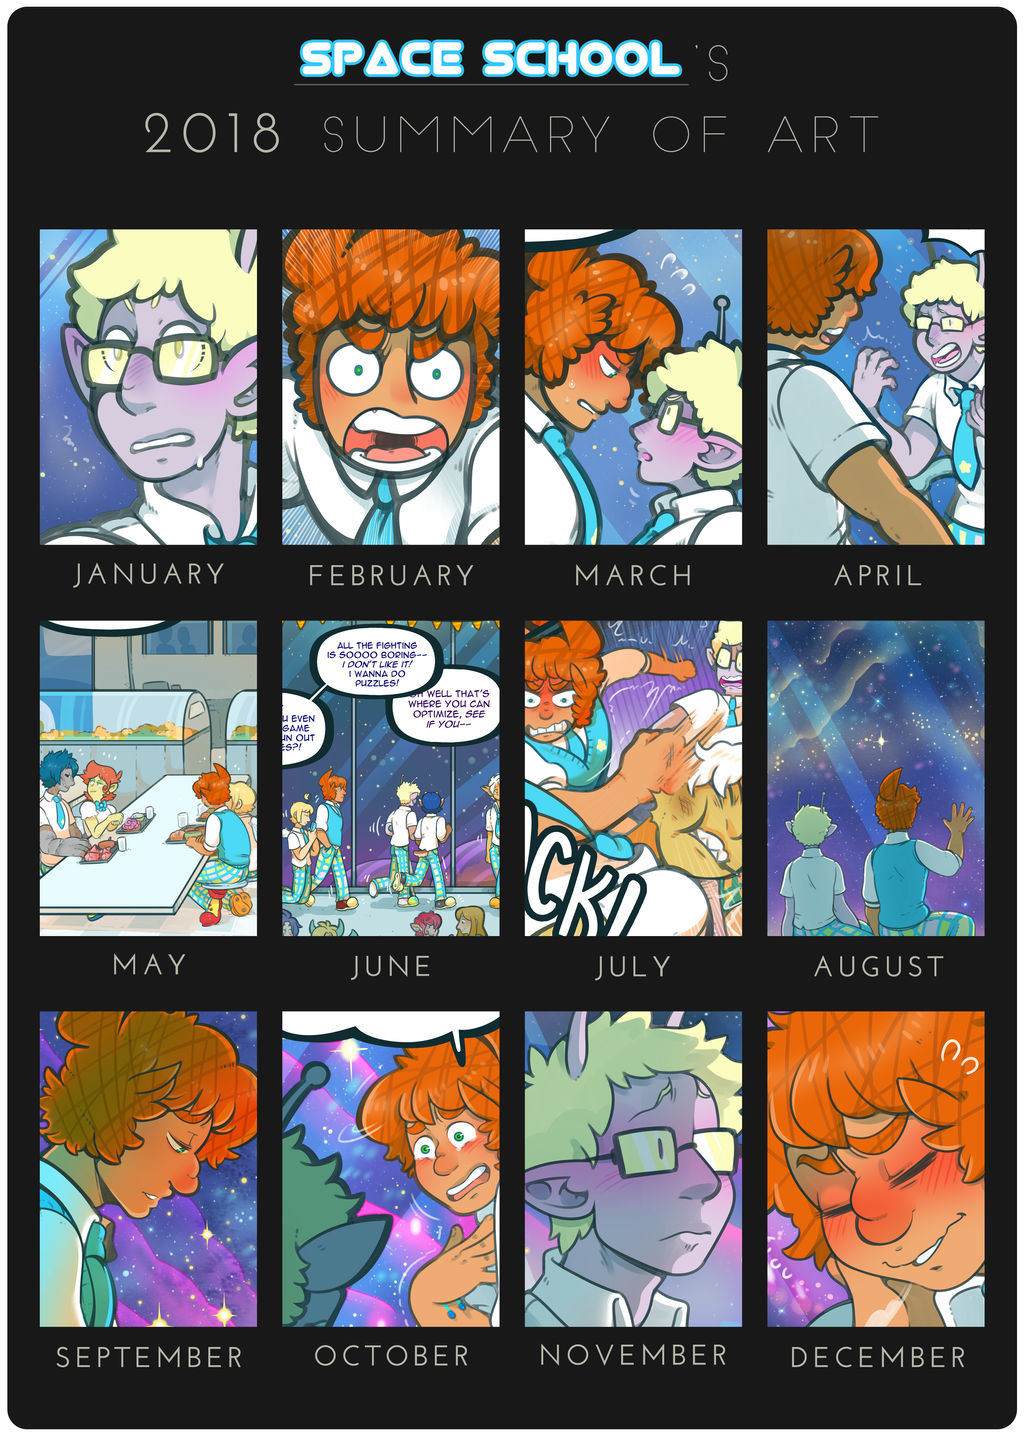 Space School - 2018 Summary by DarkChibiShadow